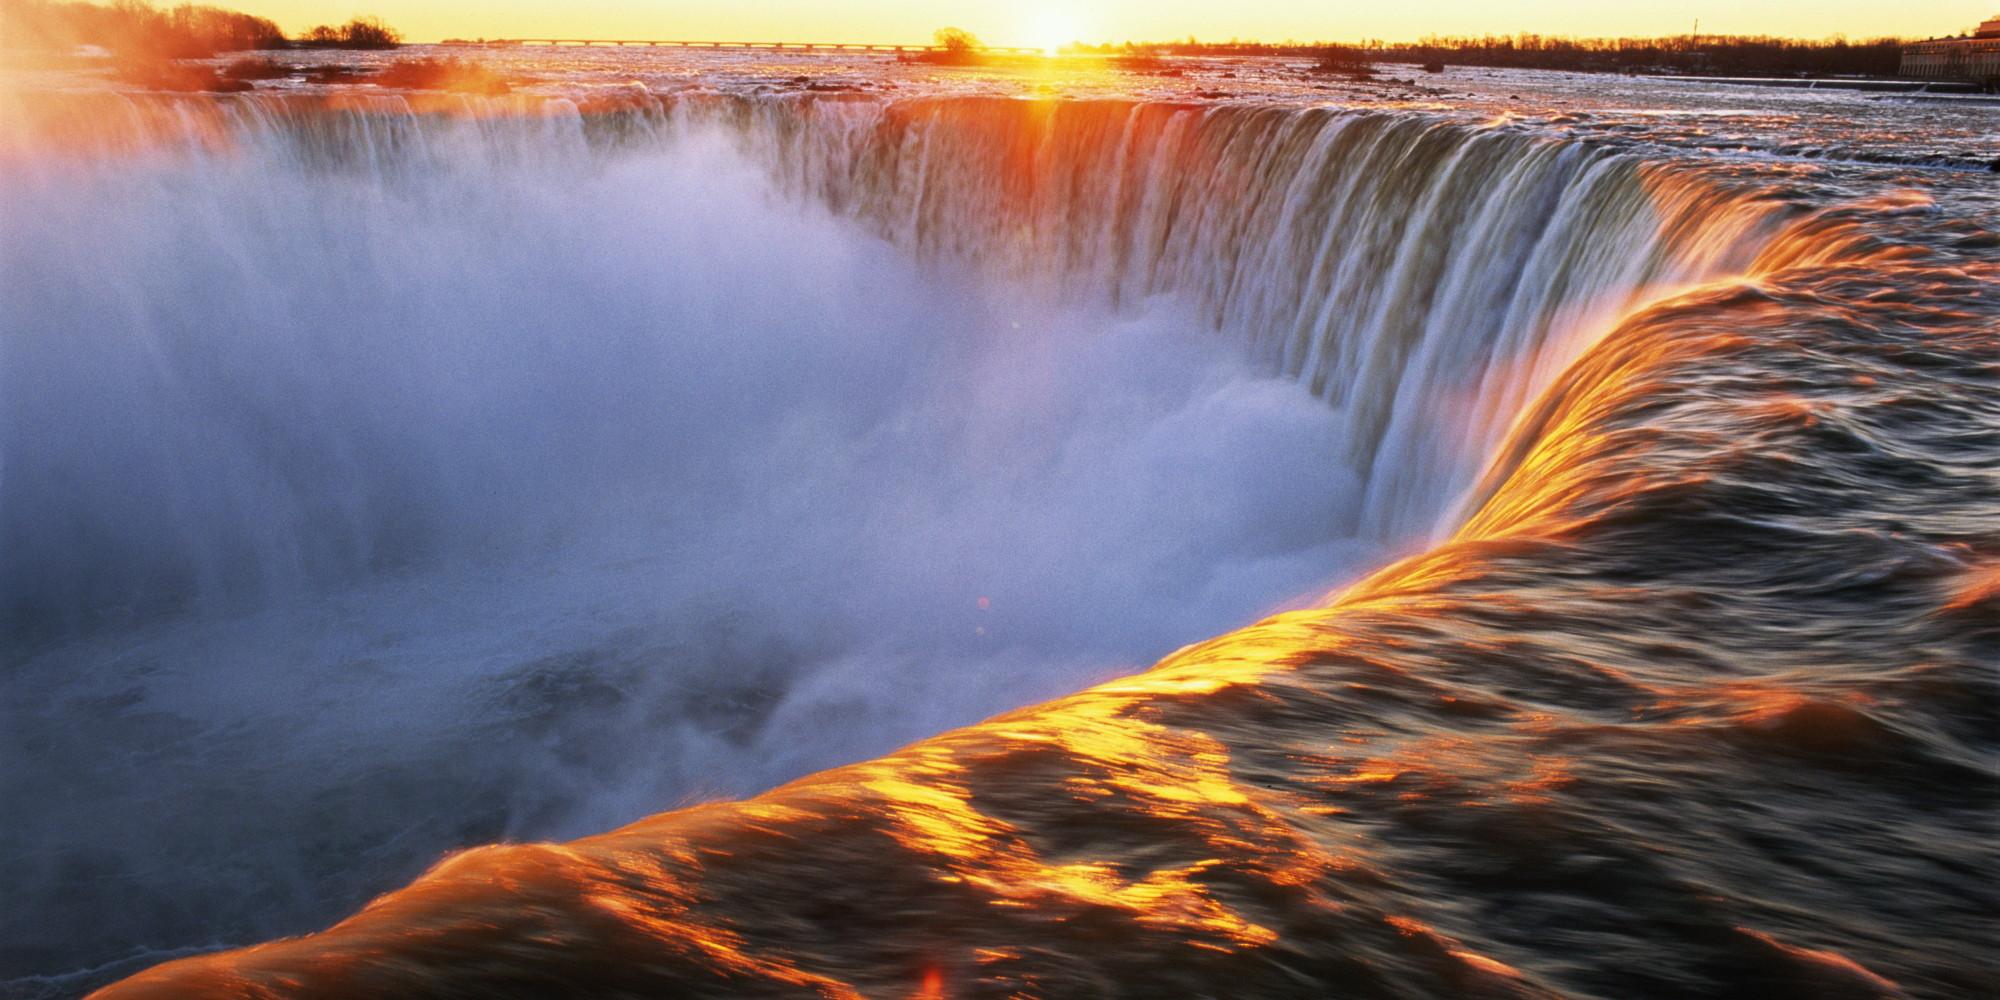 In Niagara Falls Family Travel Writers Agree Passport Is